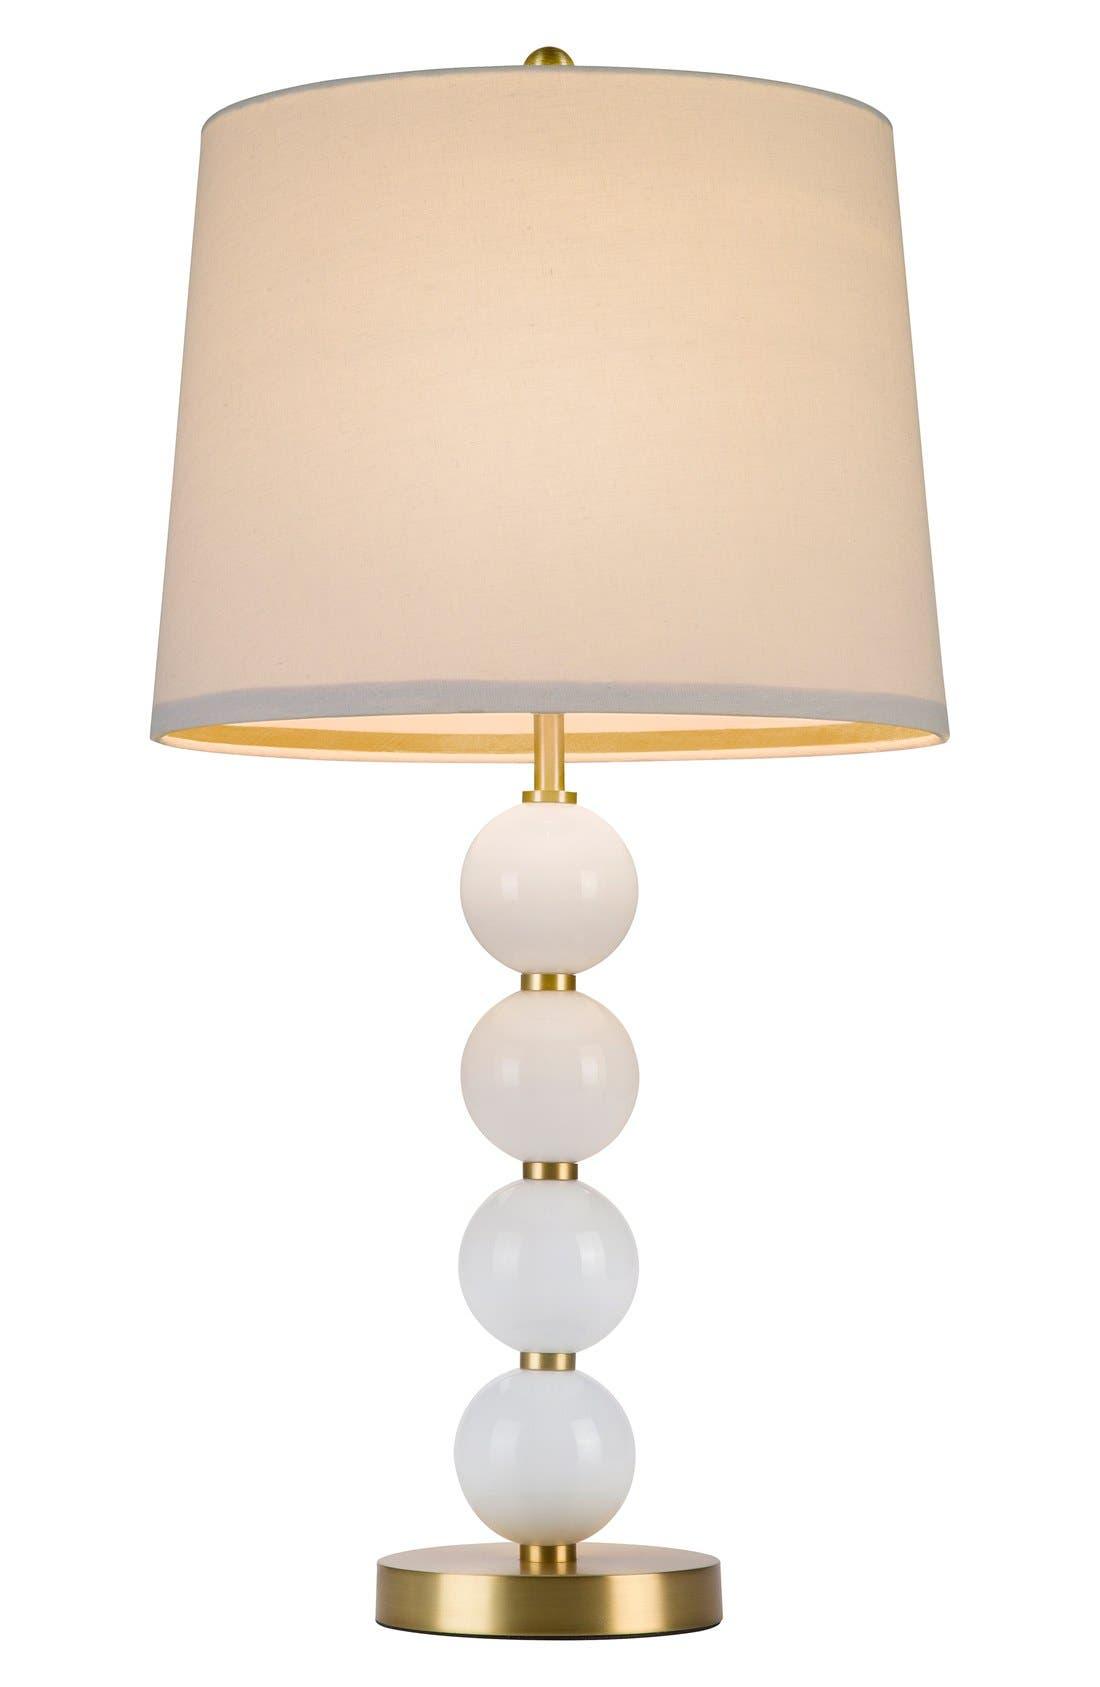 Stacked Ball Table Lamp,                             Main thumbnail 1, color,                             650